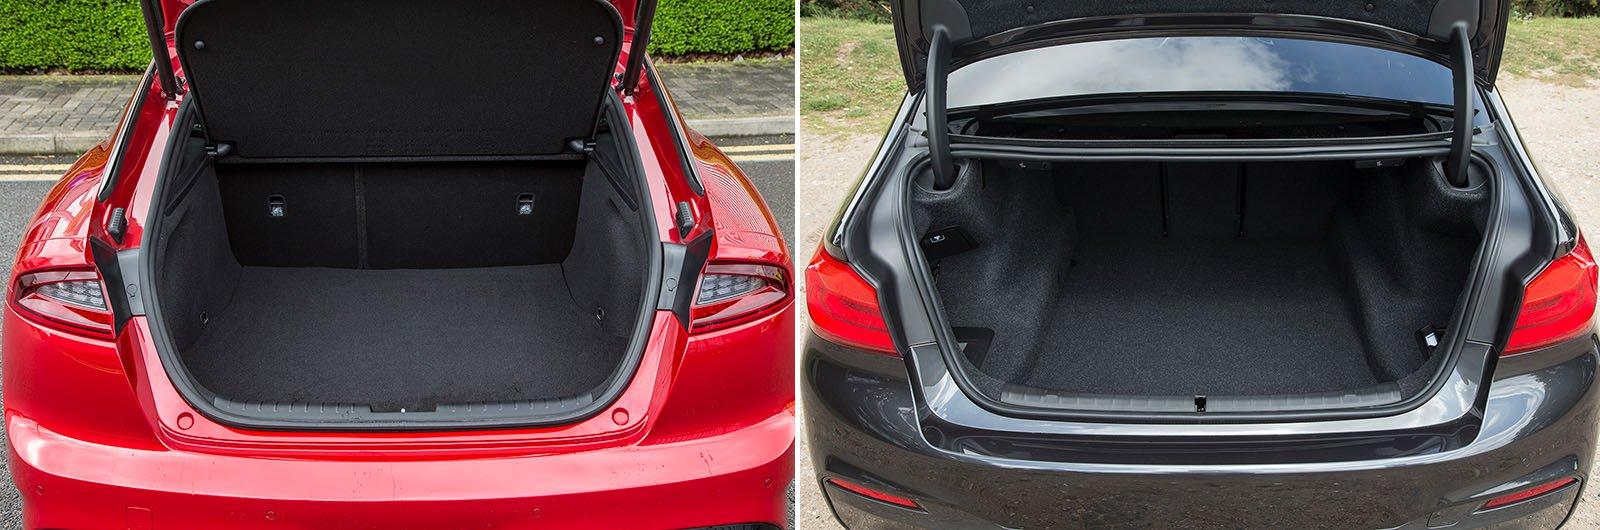 New Kia Stinger vs used BMW 5 Series – space & practicality